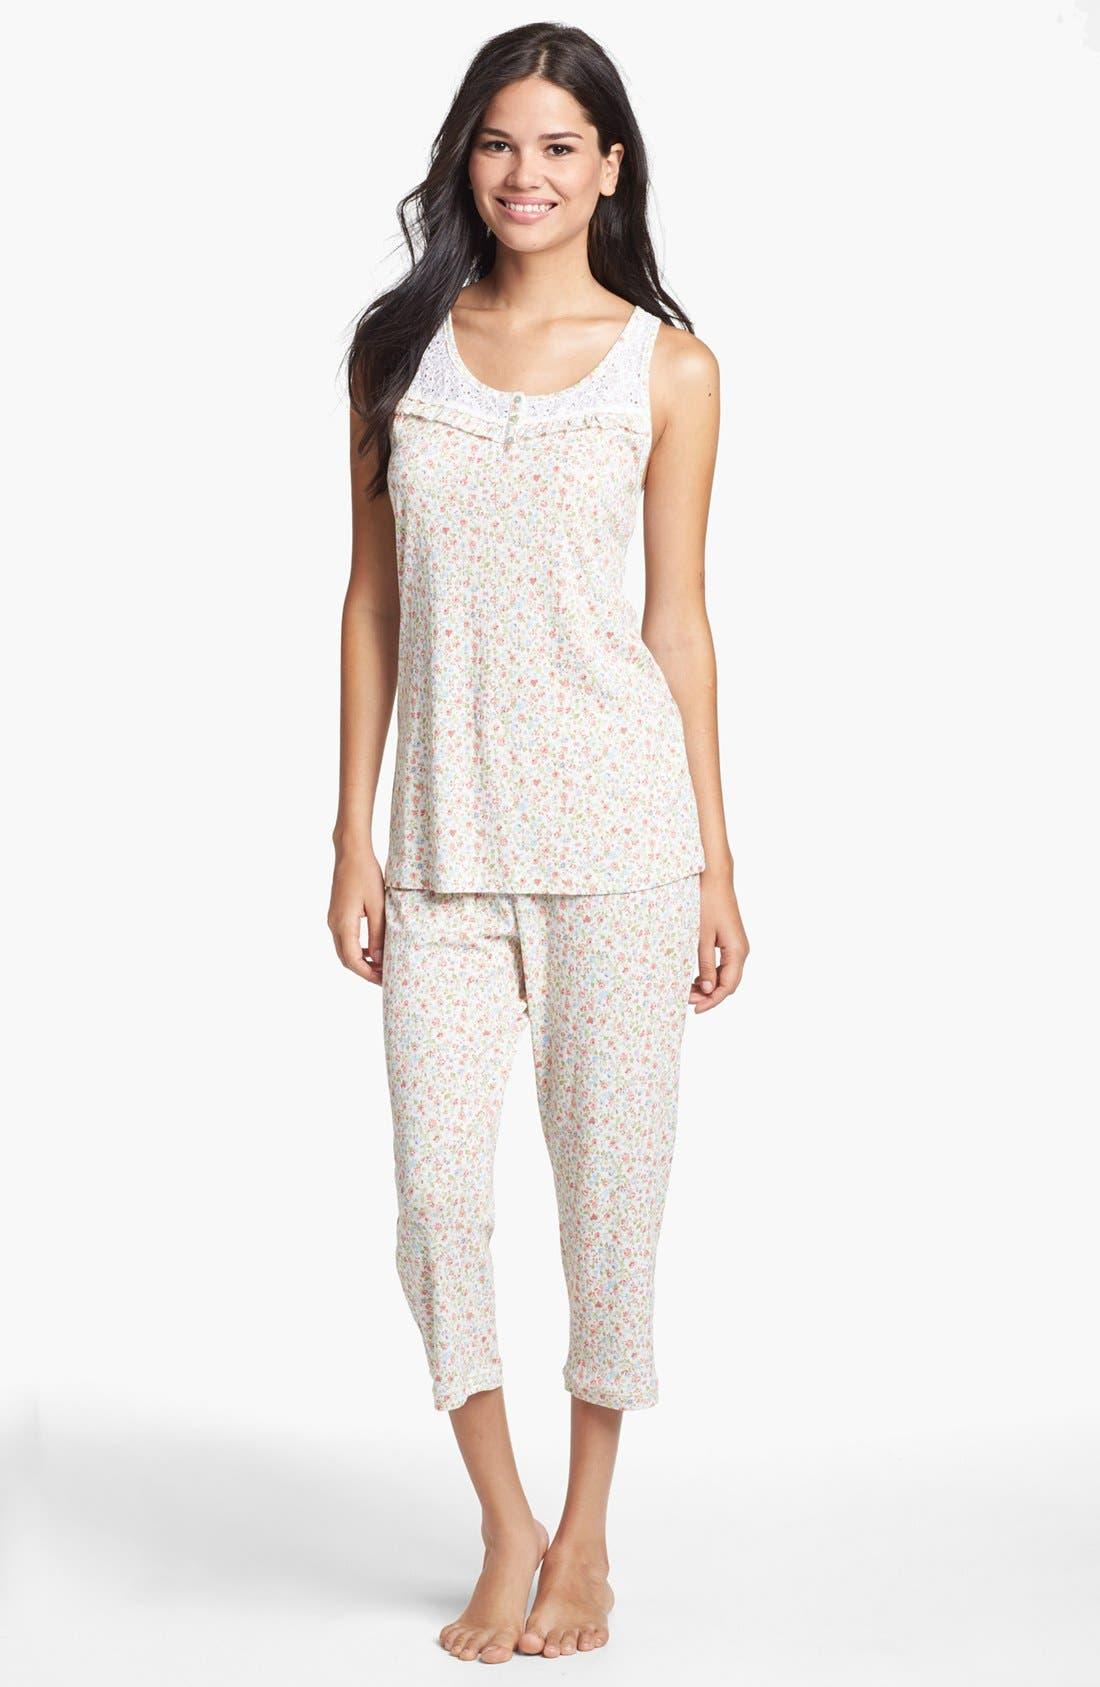 Main Image - Carole Hochman Designs 'Liberty Floral' Capri Pajamas